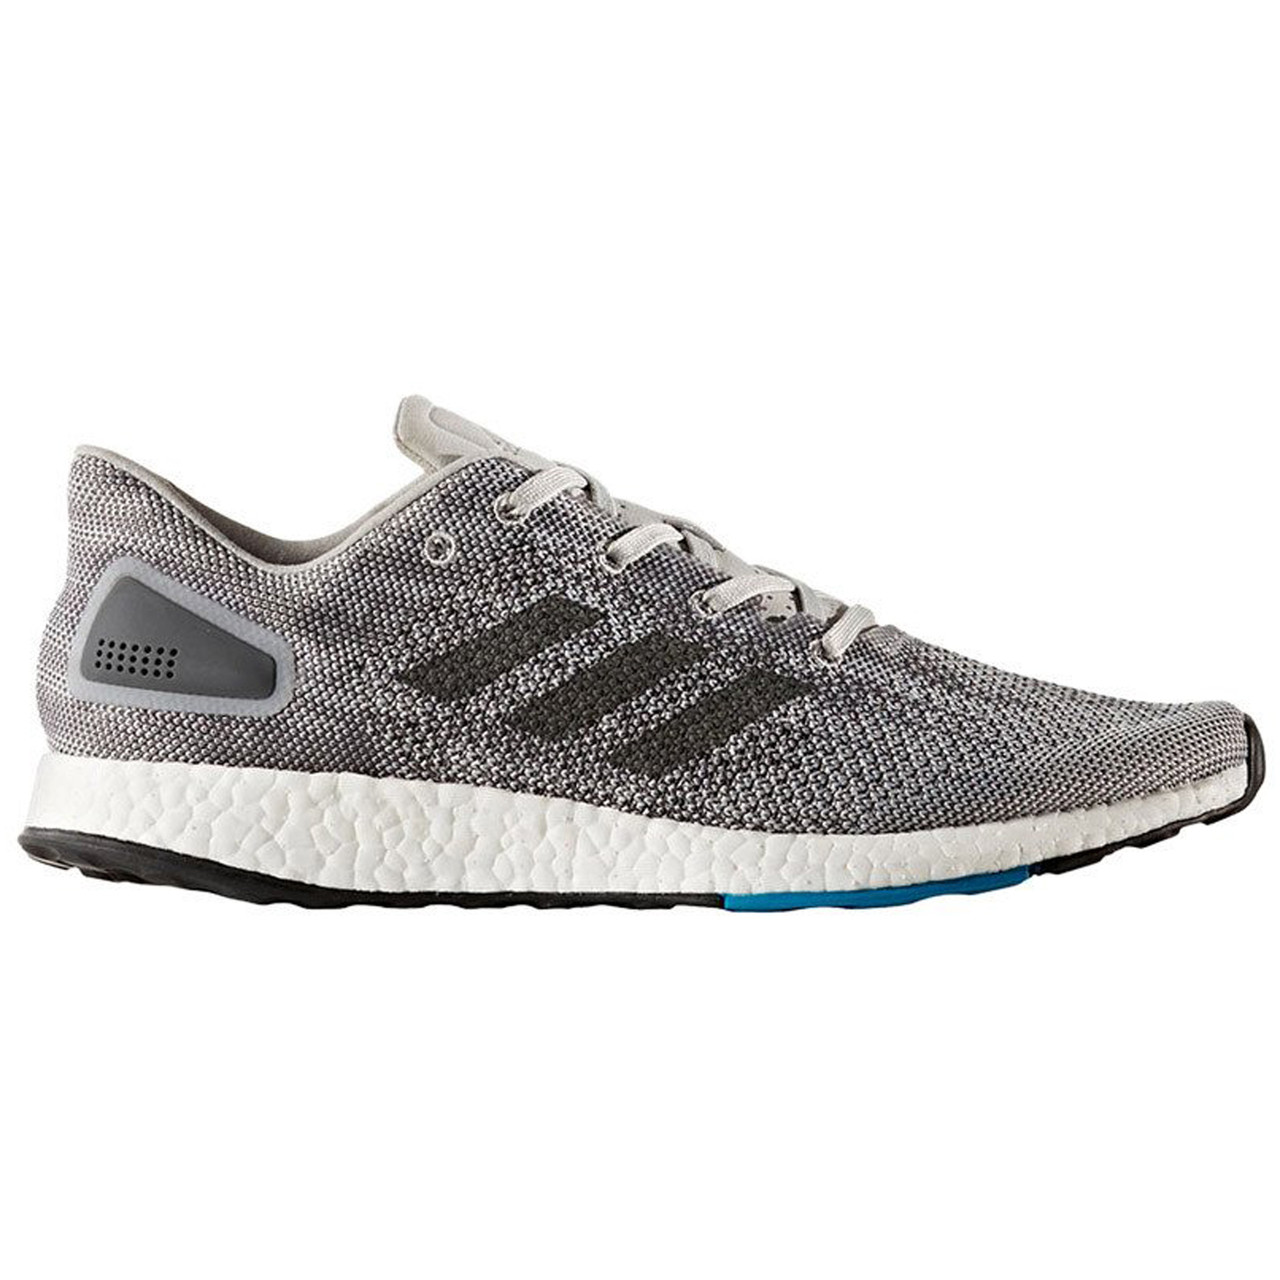 8f4a1aa4e Adidas PureBOOST DPR Mens Sneakers S82010 - Grey